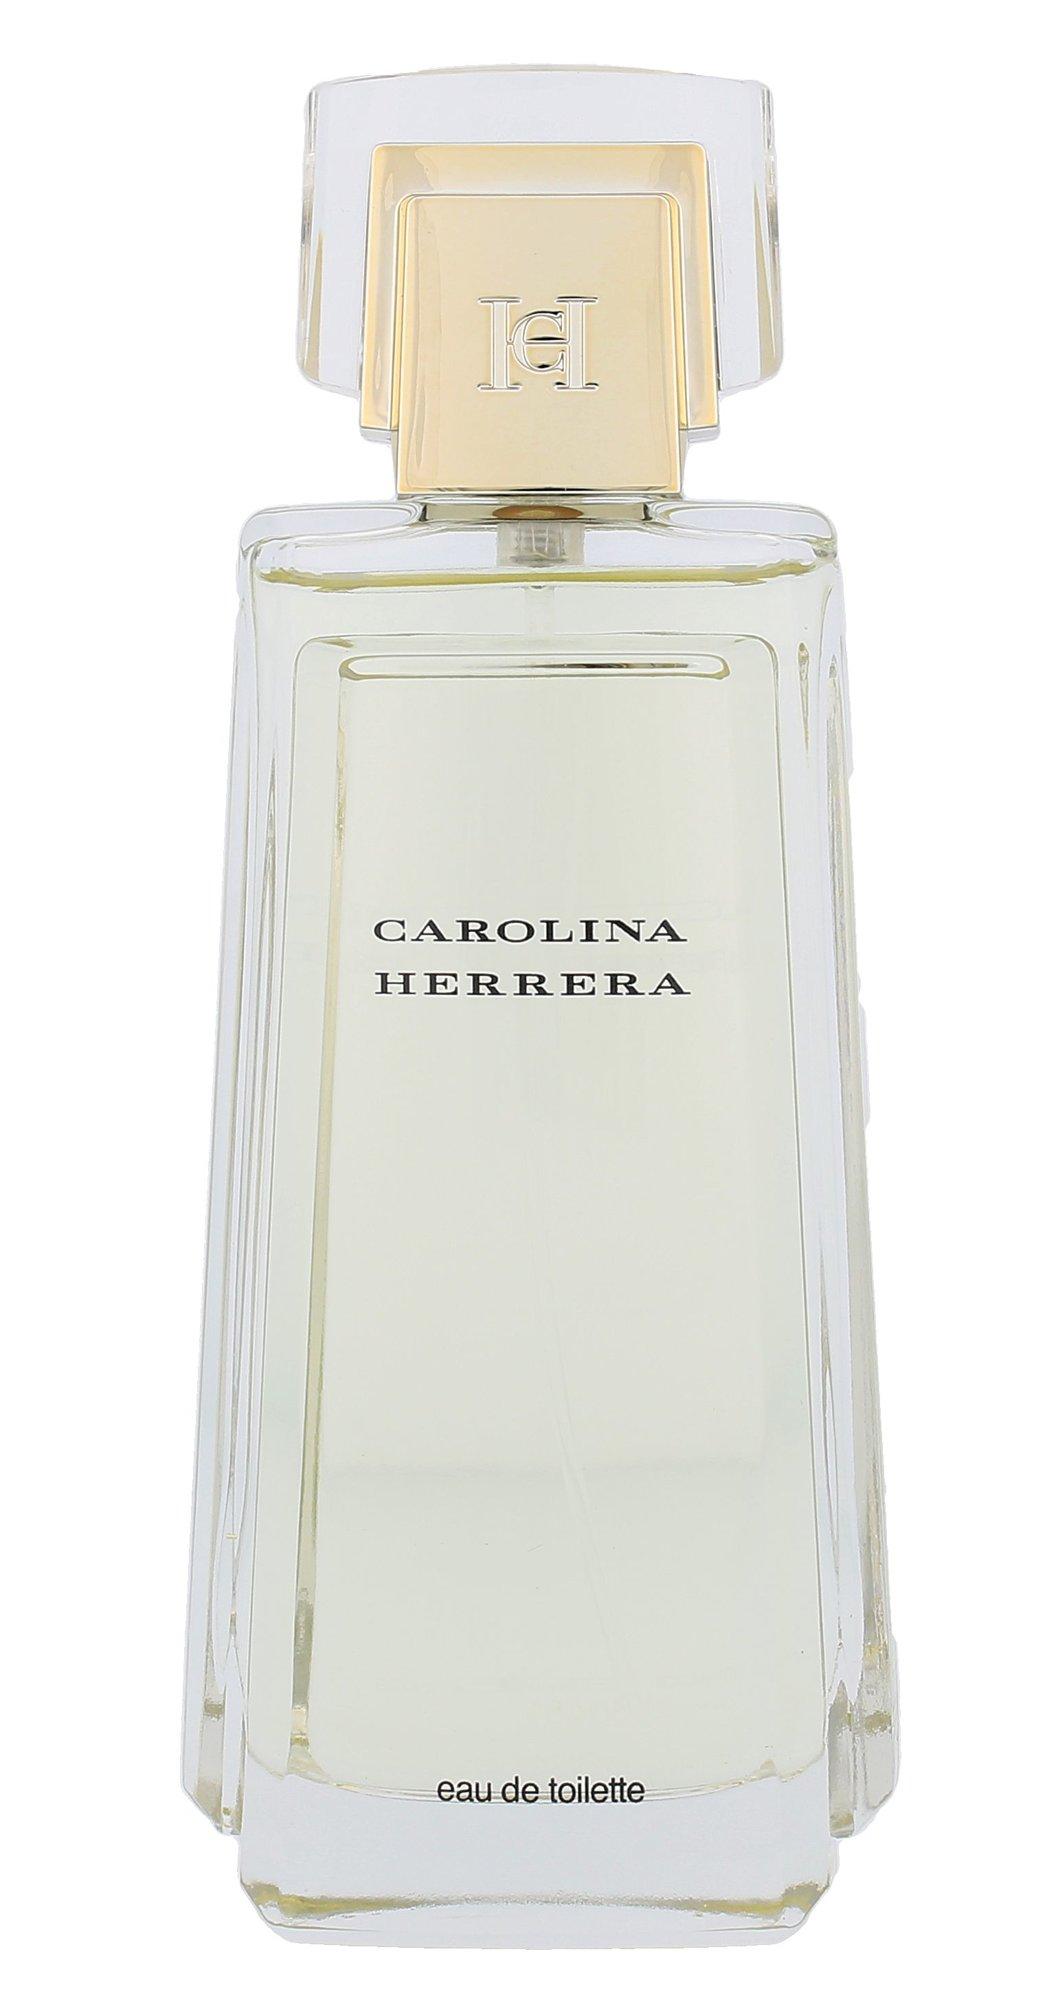 Carolina Herrera Carolina Herrera EDT 100ml